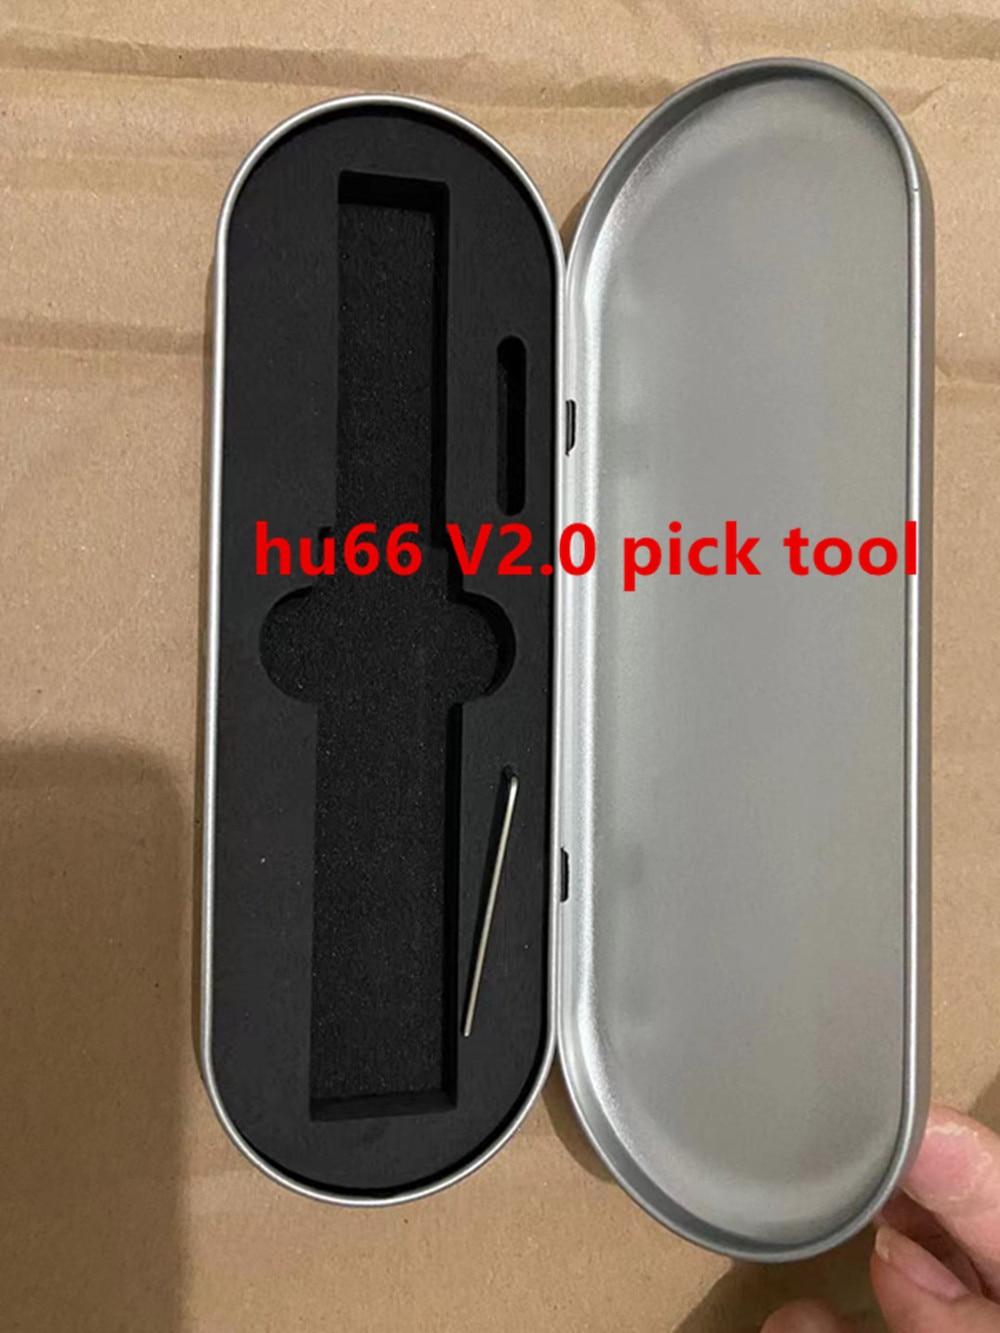 auto tool HU66 Super tool version 2 pick tool vs lishi 2 in 1 tool